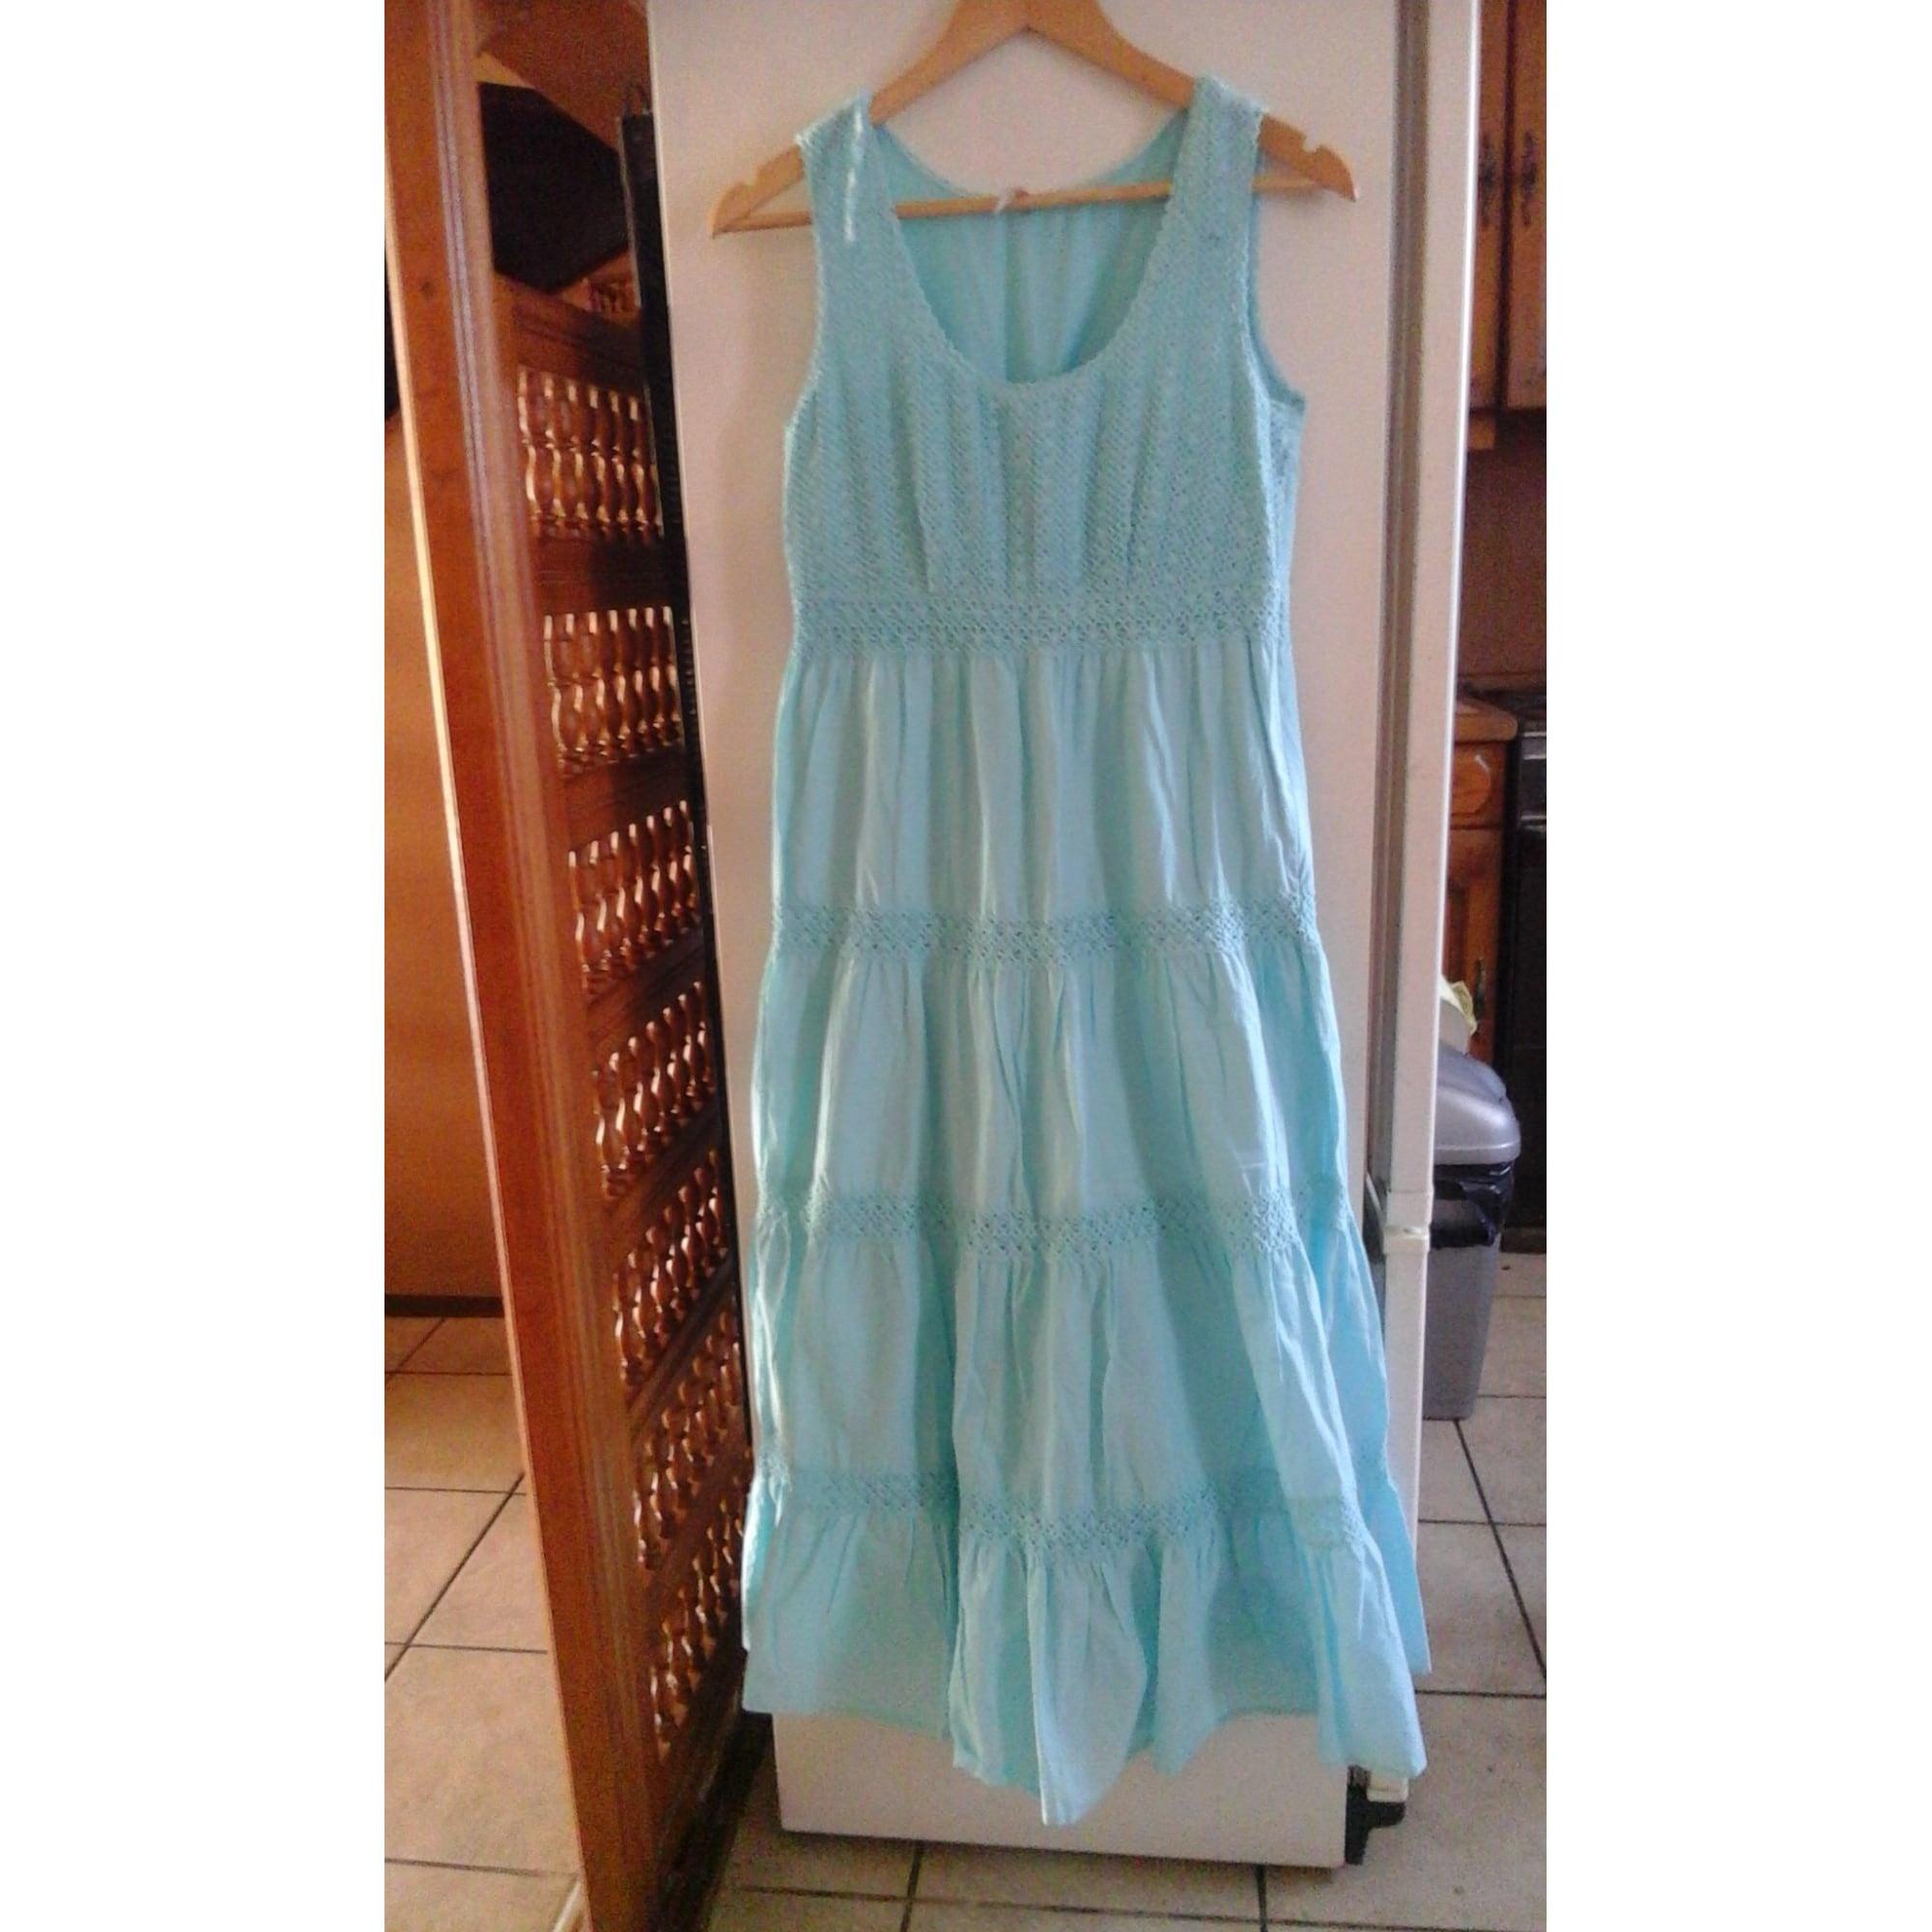 Robe Longue Blancheporte 36 S T1 7828515